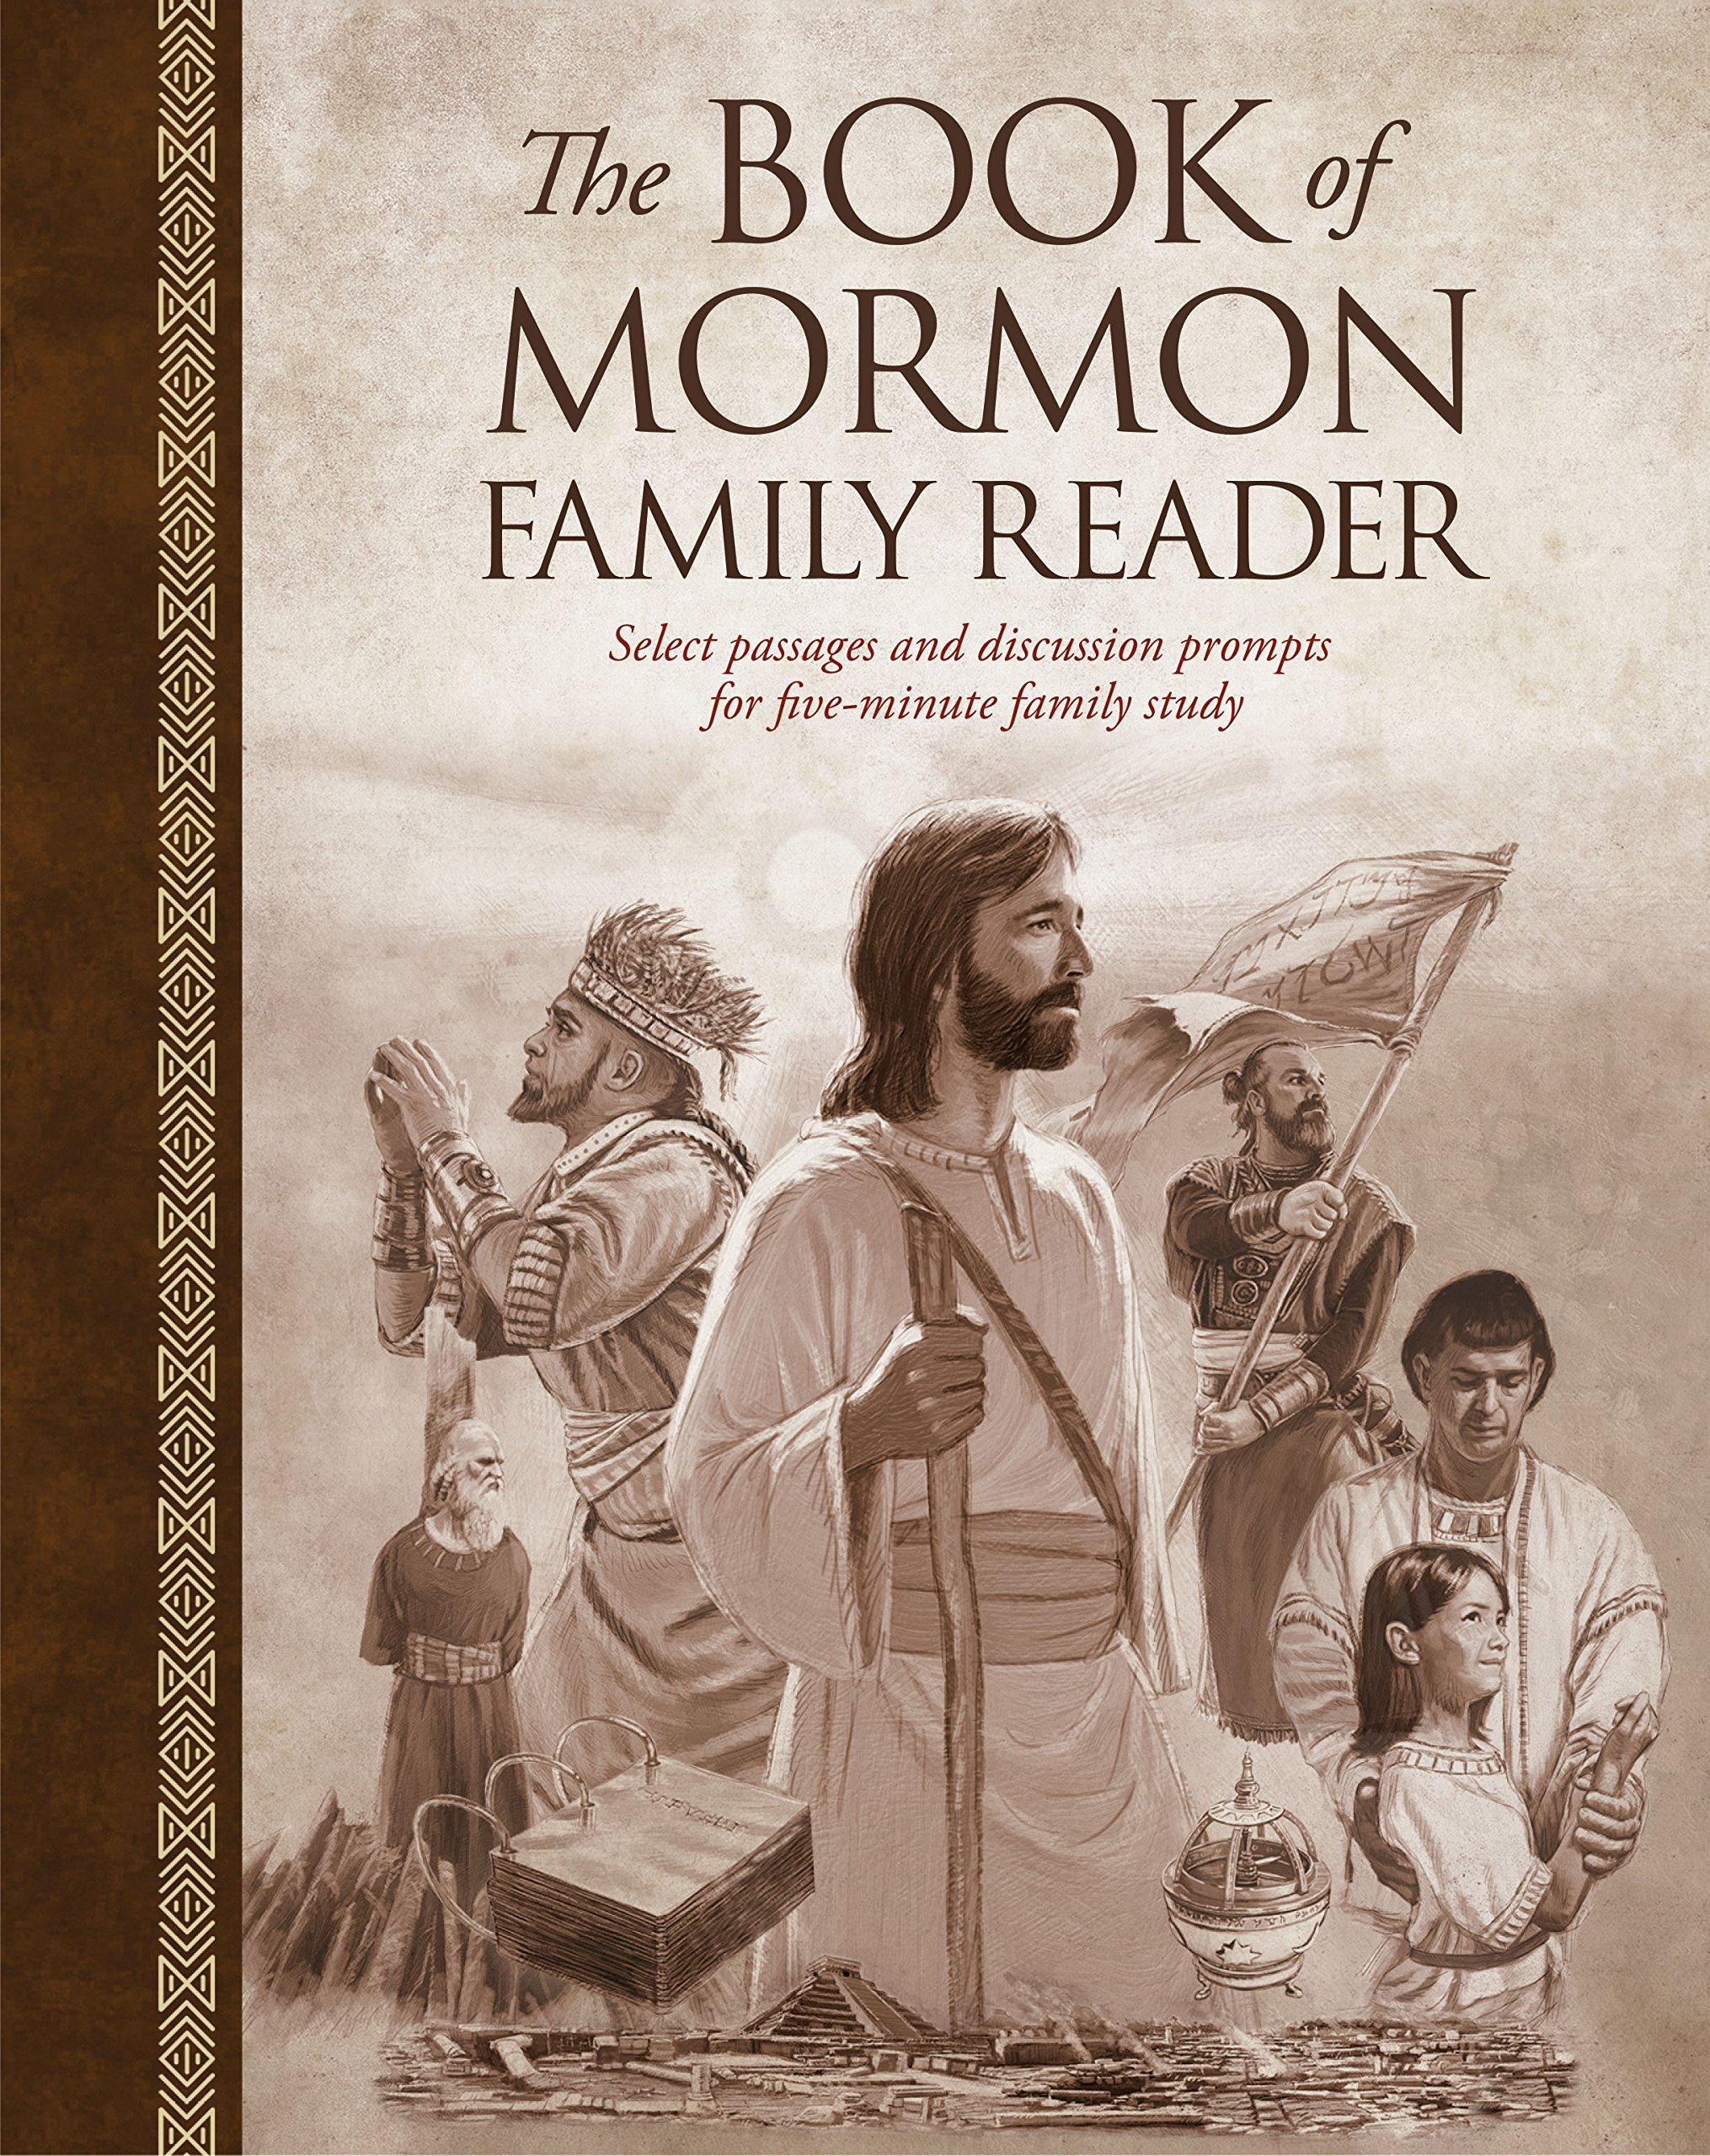 The Book of Mormon Family Reader